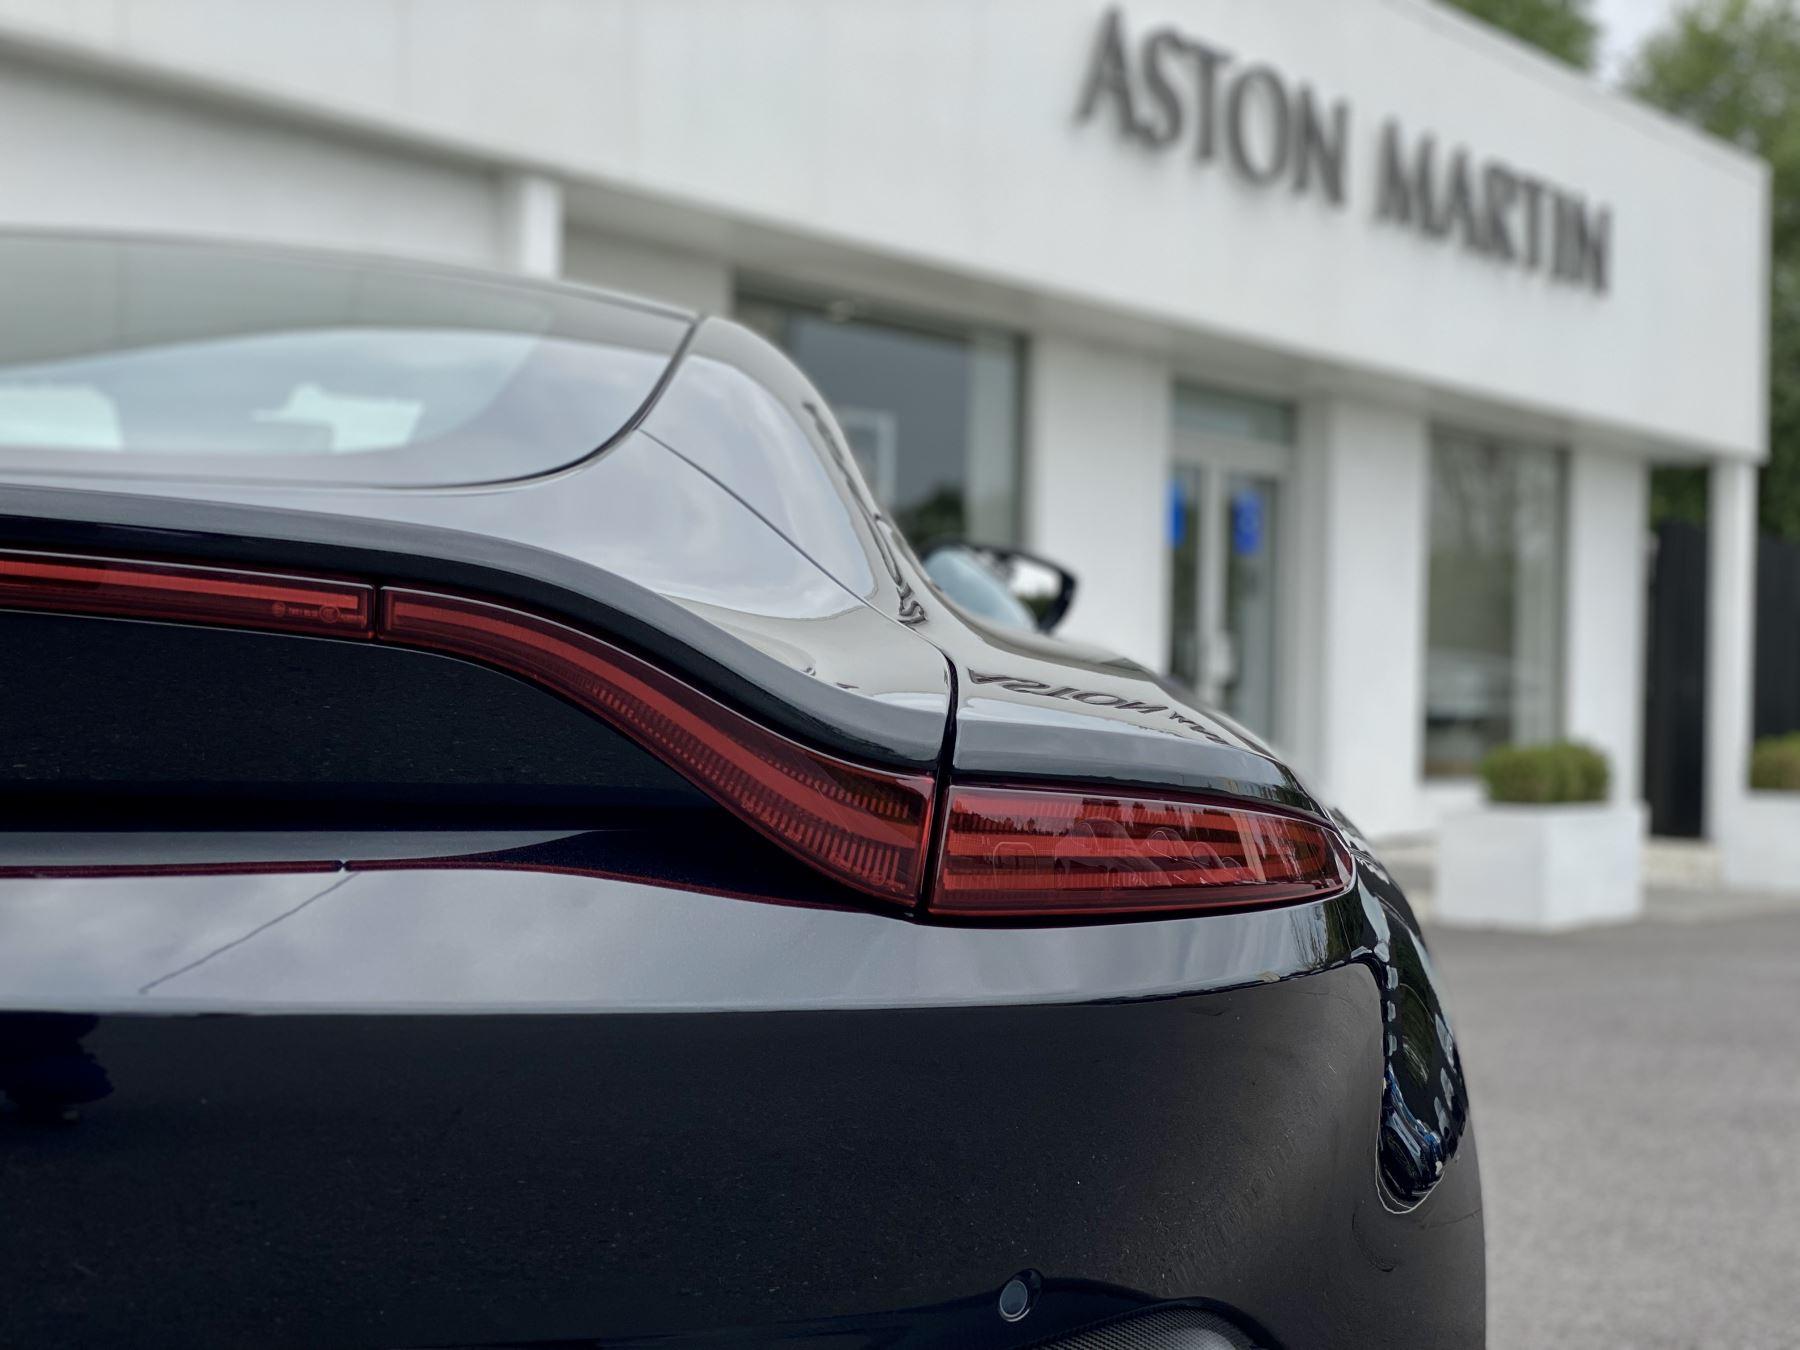 Aston Martin New Vantage 2dr ZF 8 Speed Auto. 4.0 Twin Turbo ZF Gearbox  Reversing Camera Heated Seats Ceramic Brakes image 12